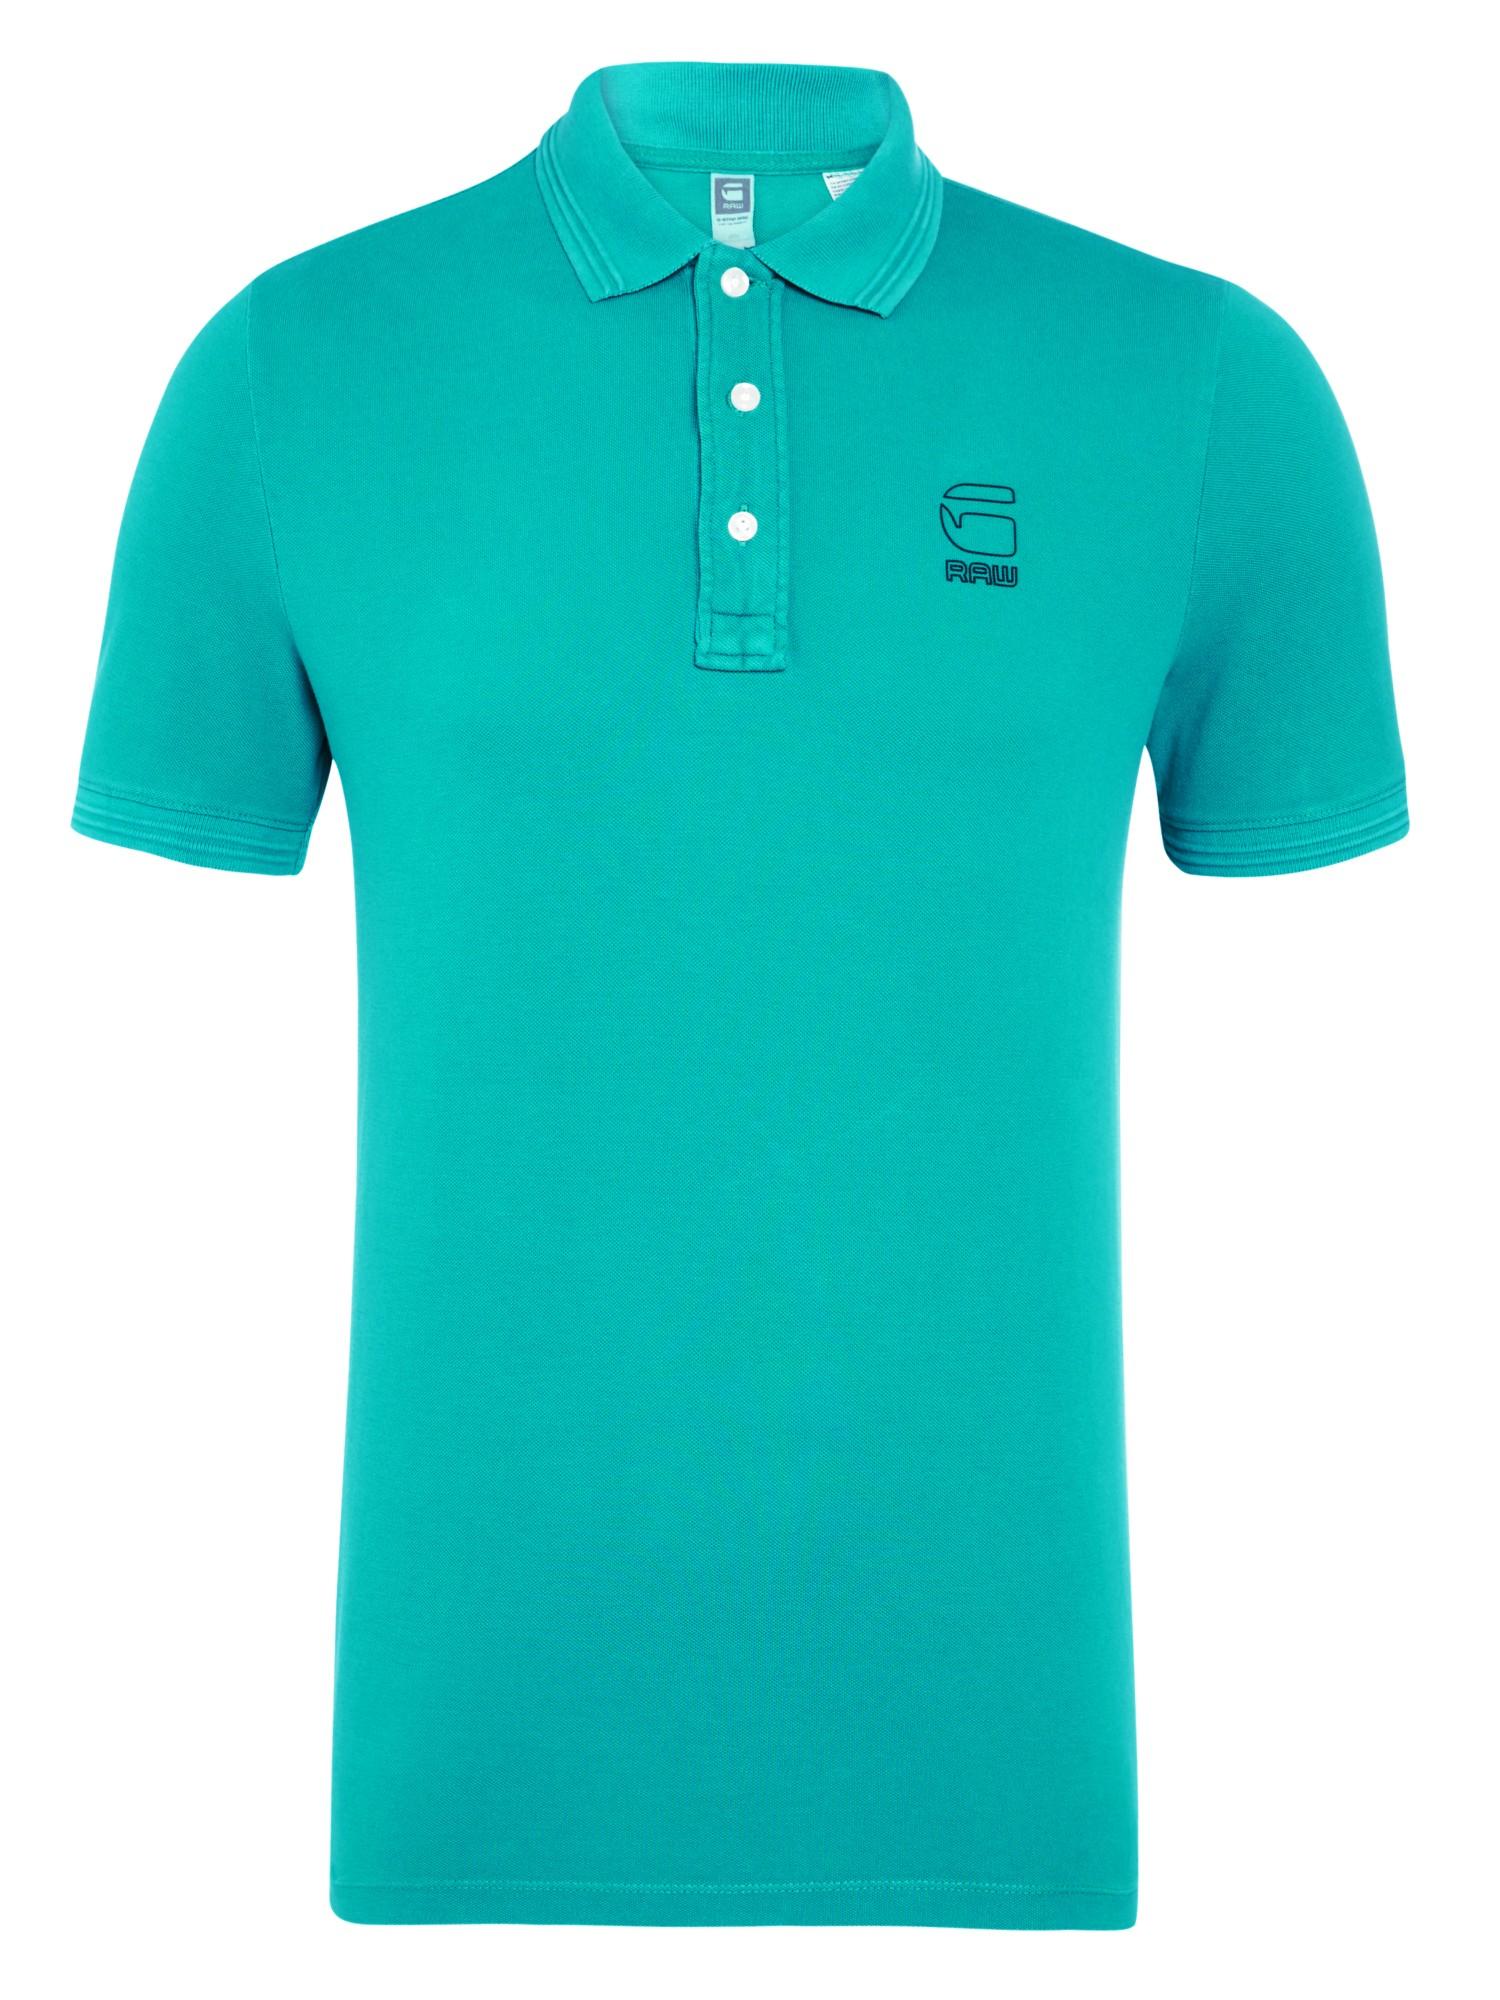 G-Star Raw Fero Polo Shirt in Green for Men - Lyst f52152b8d5